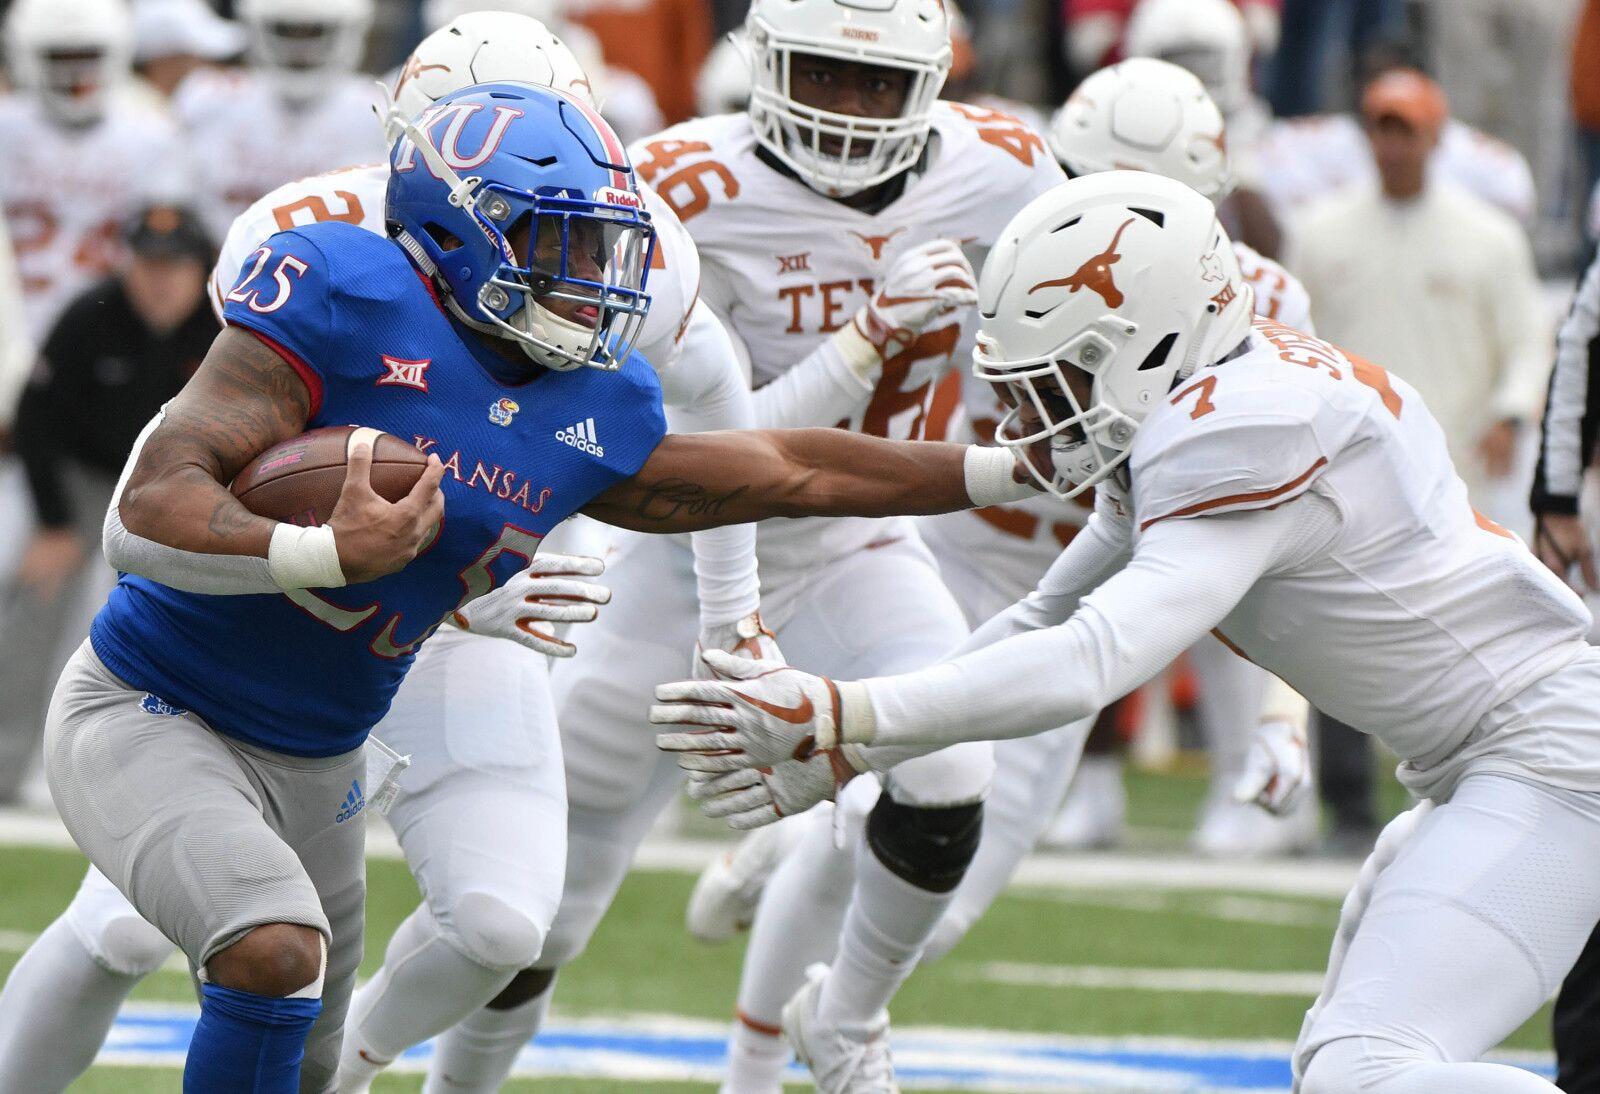 Texas Football: How will the Longhorns rebound in Week 8 vs. Kansas?